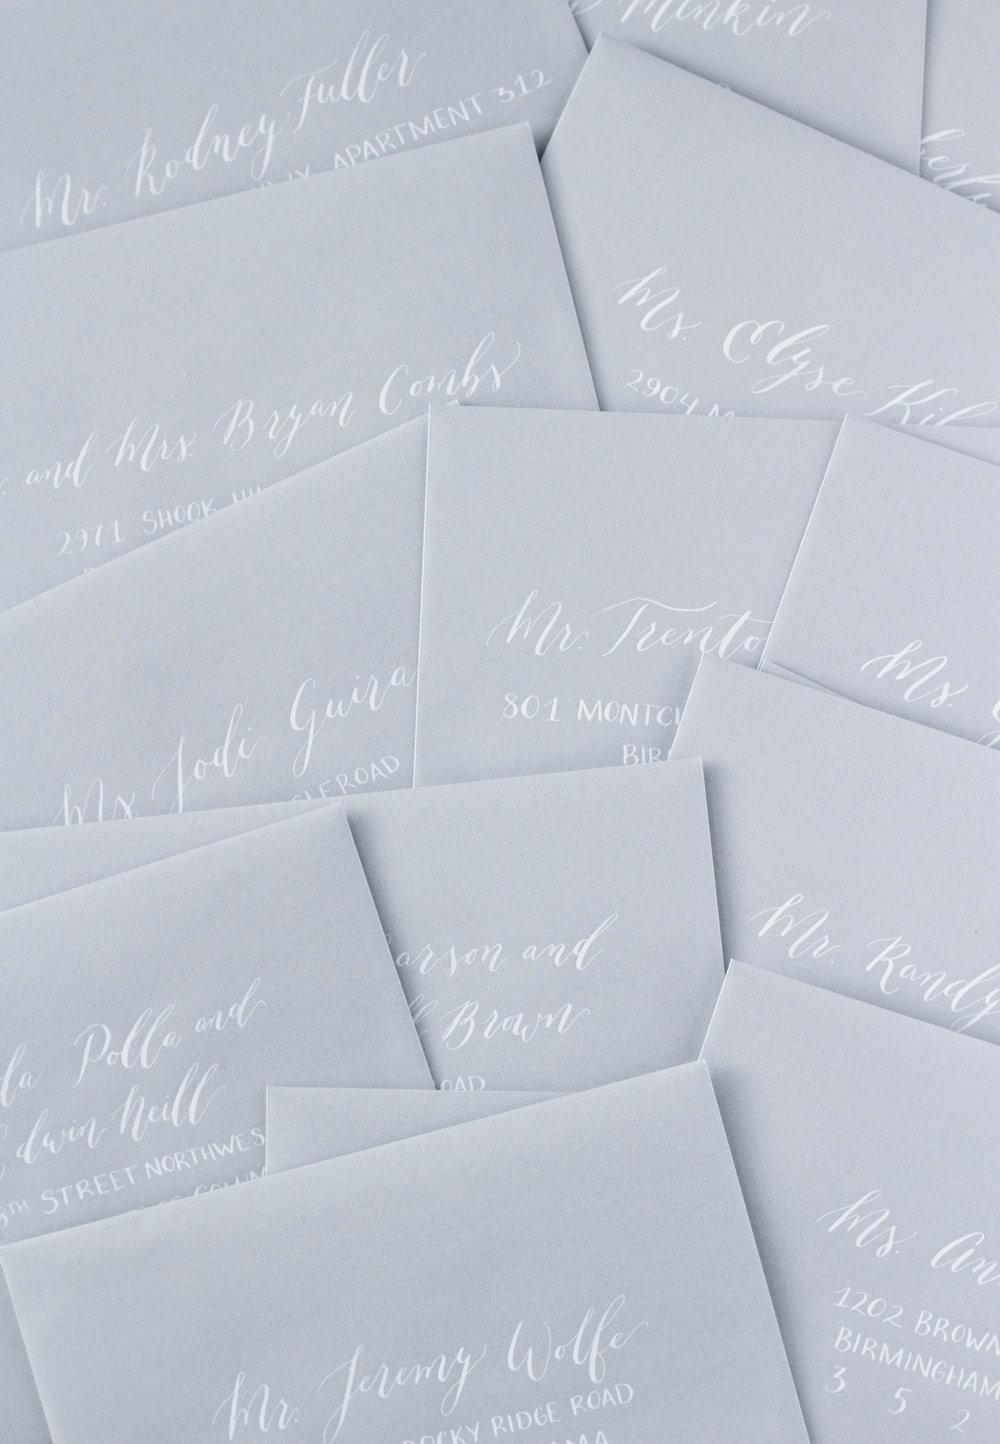 Silver Envelopes, White Ink - Envelope Addressing - Modern Calligraphy